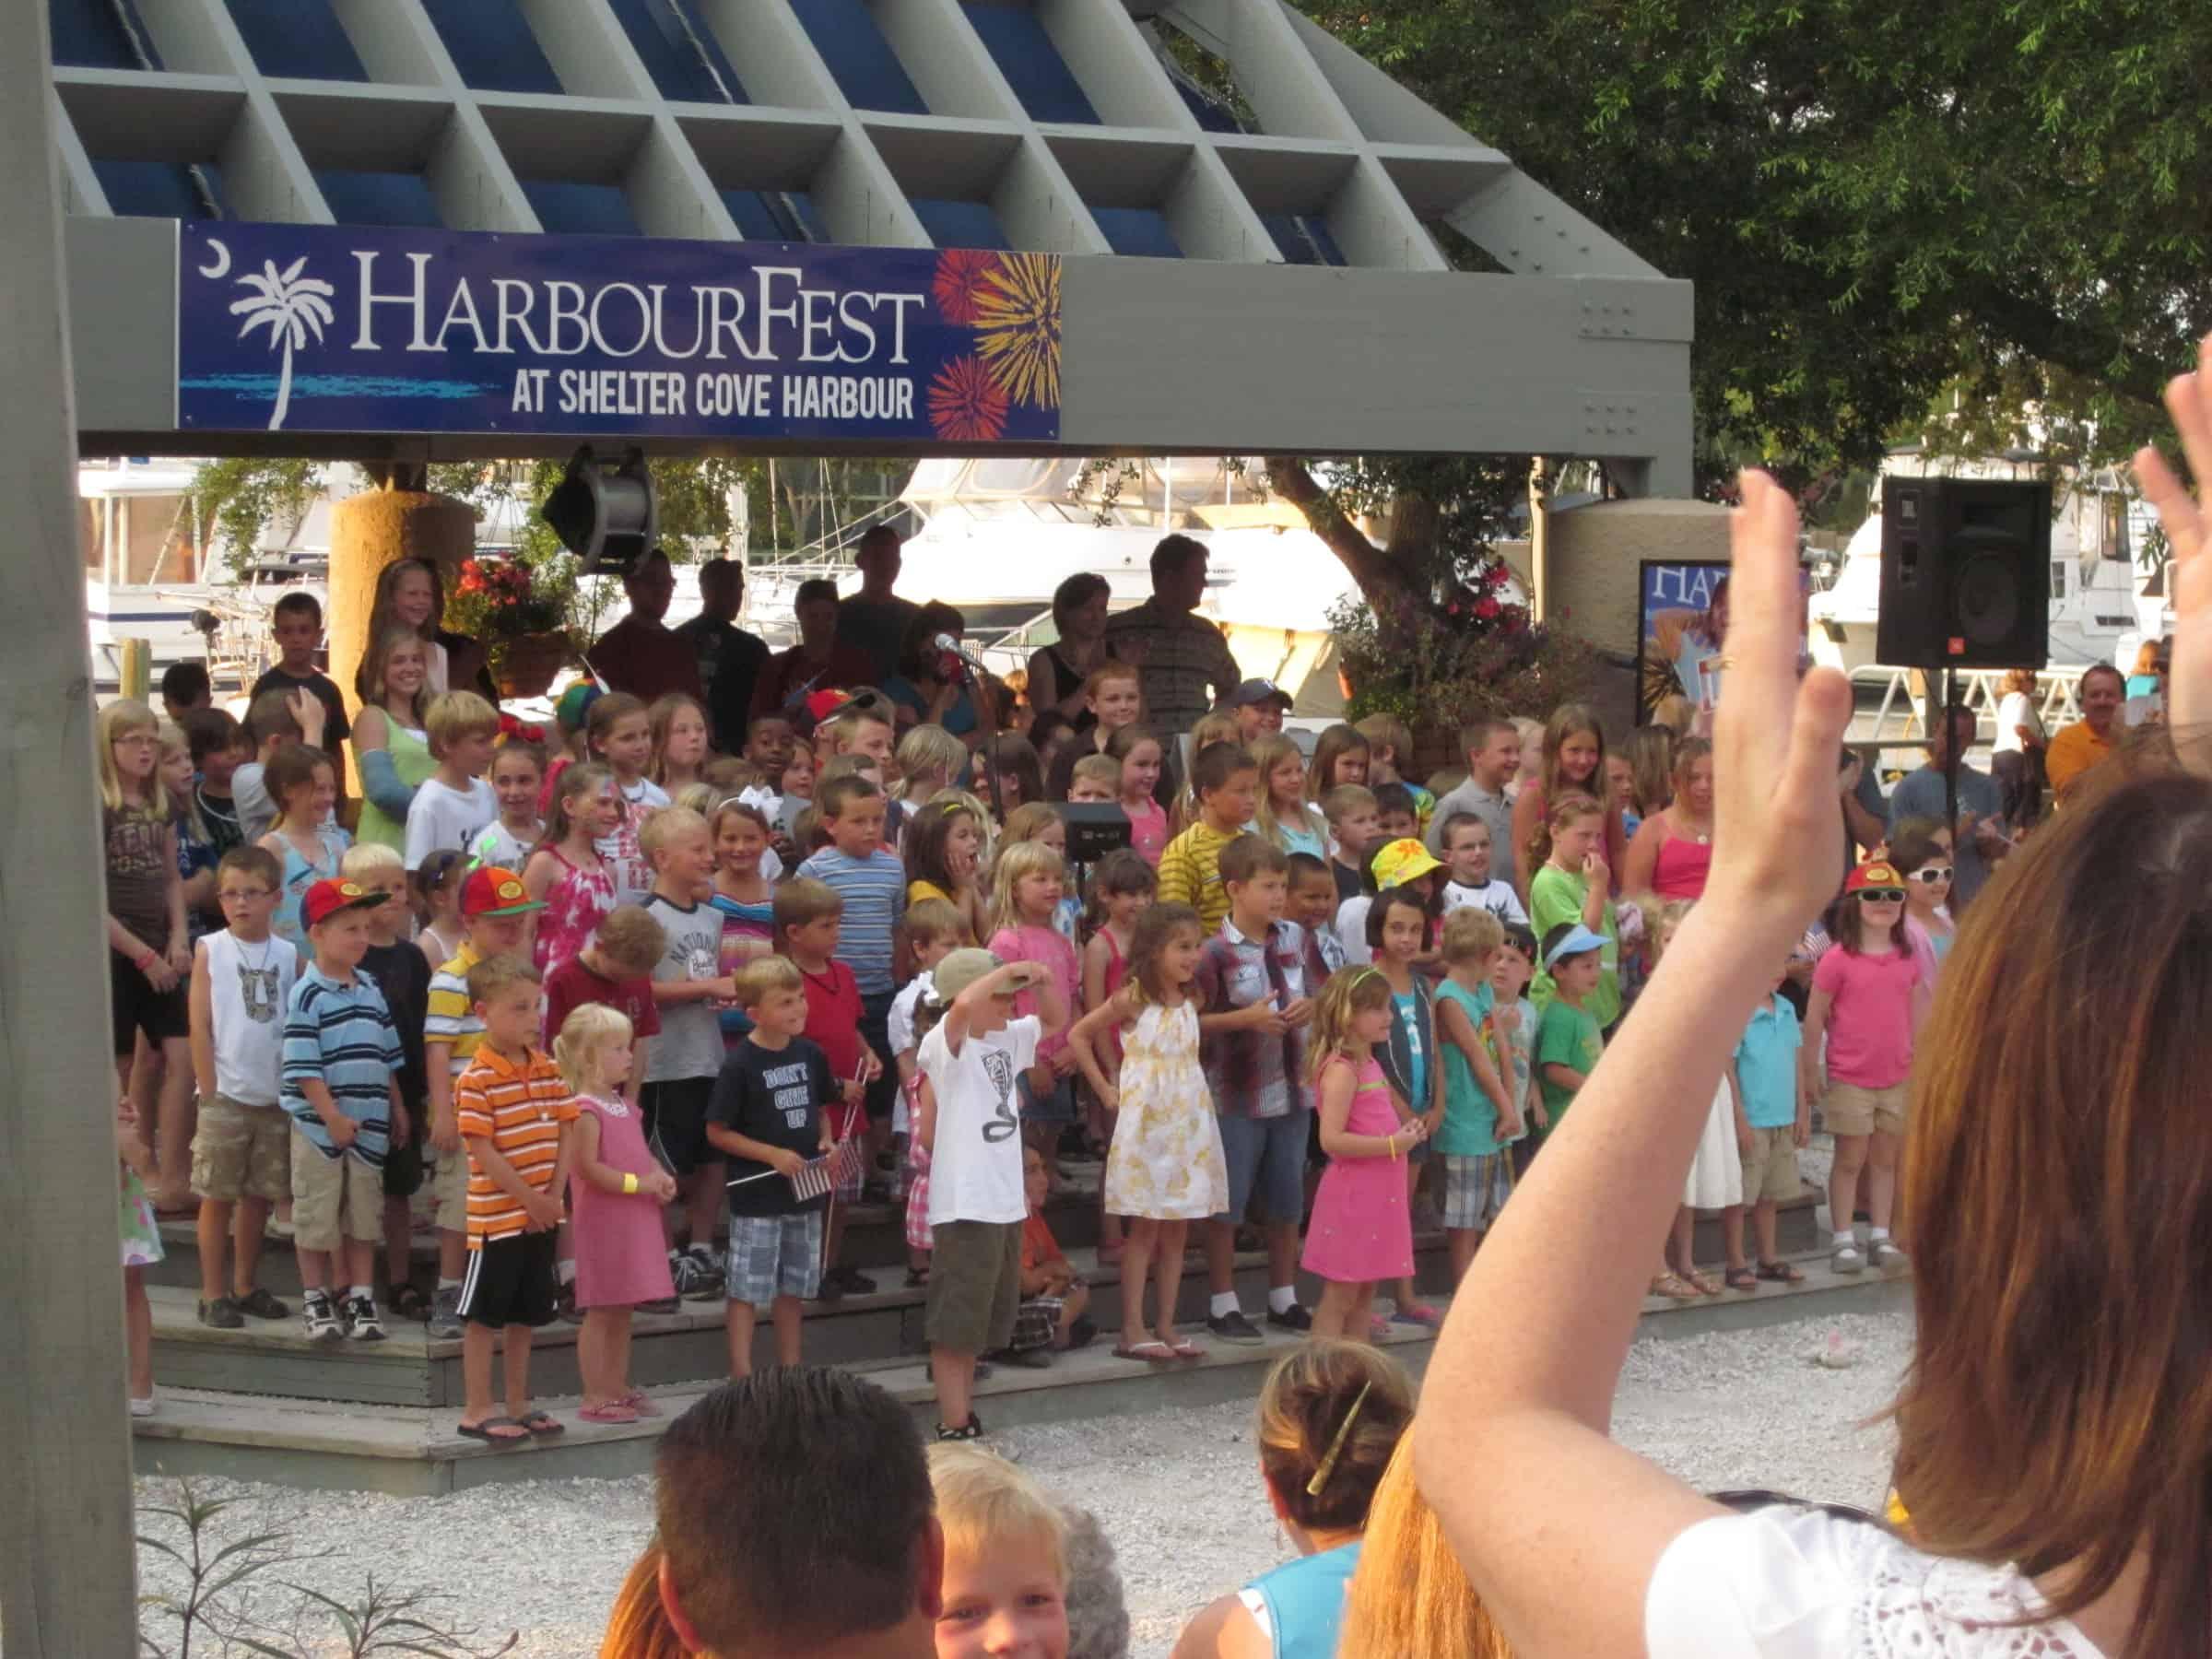 Hilton Head Calendar Of Events - Hilton Head Rental Resource Pertaining To Hilton Head Calendar Of Events 2021